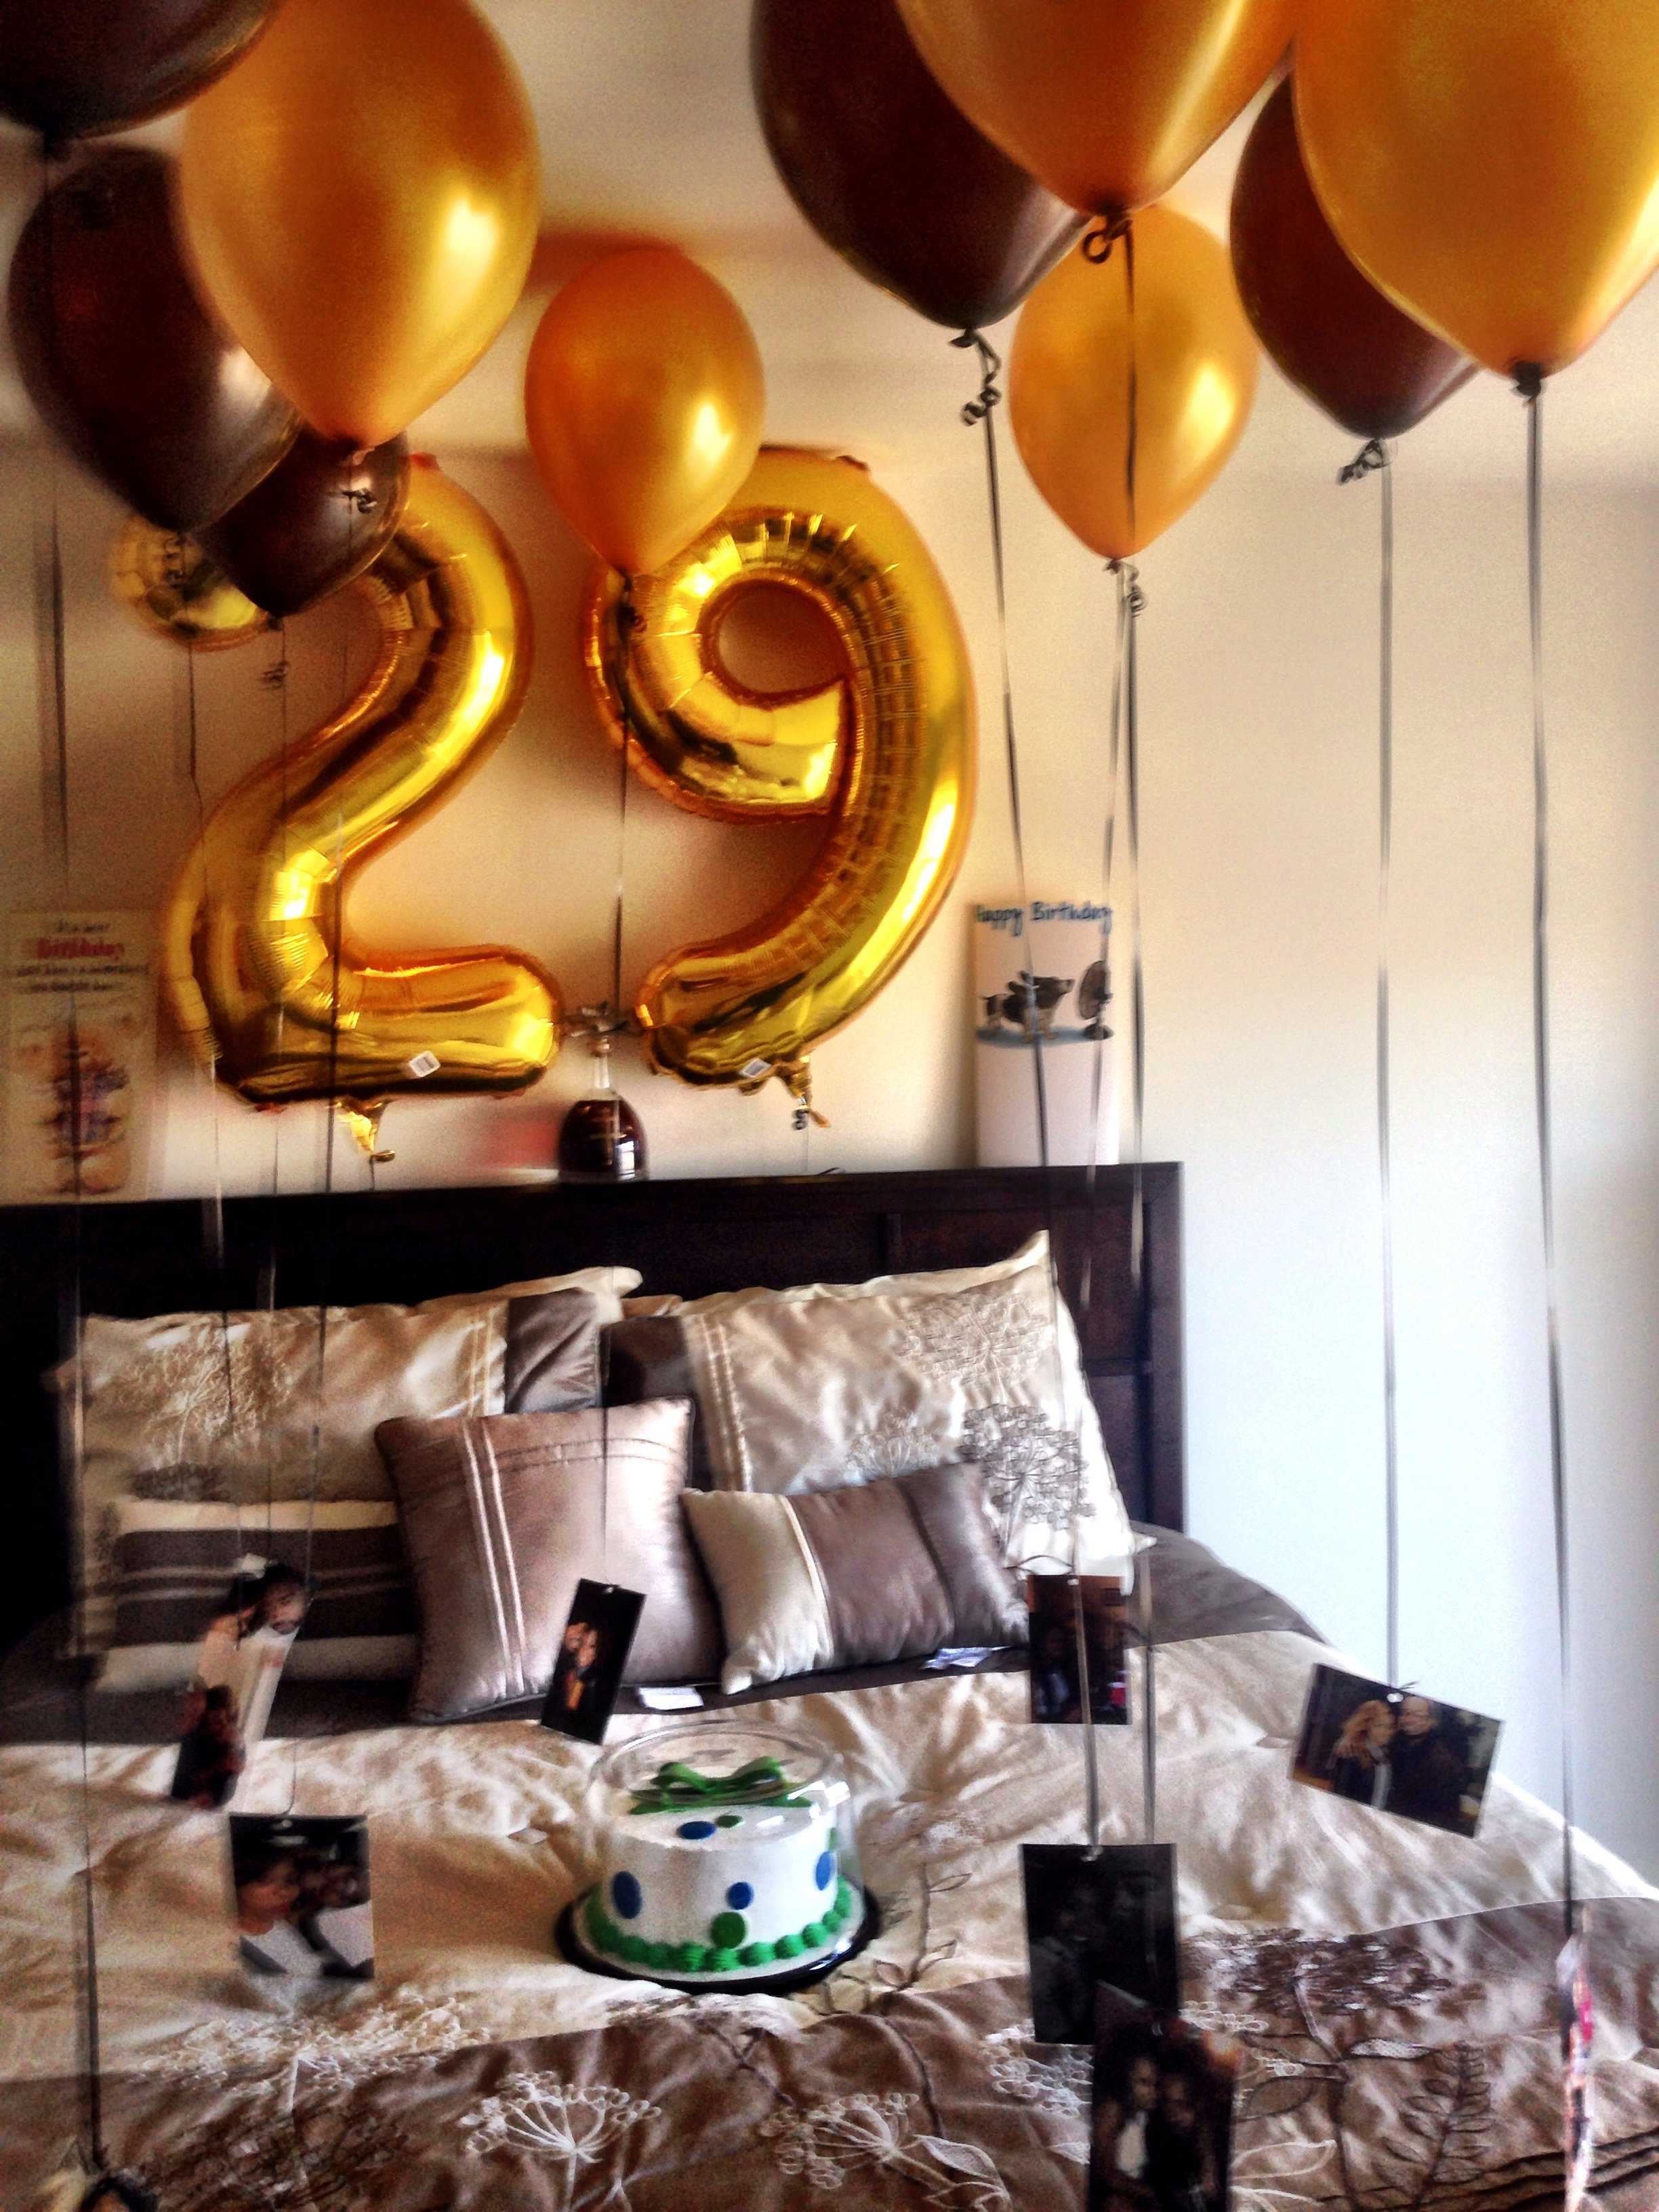 10 Stylish Surprise Birthday Ideas For Boyfriend boyfriends birthday birthdays pinterest boyfriends birthdays 4 2020